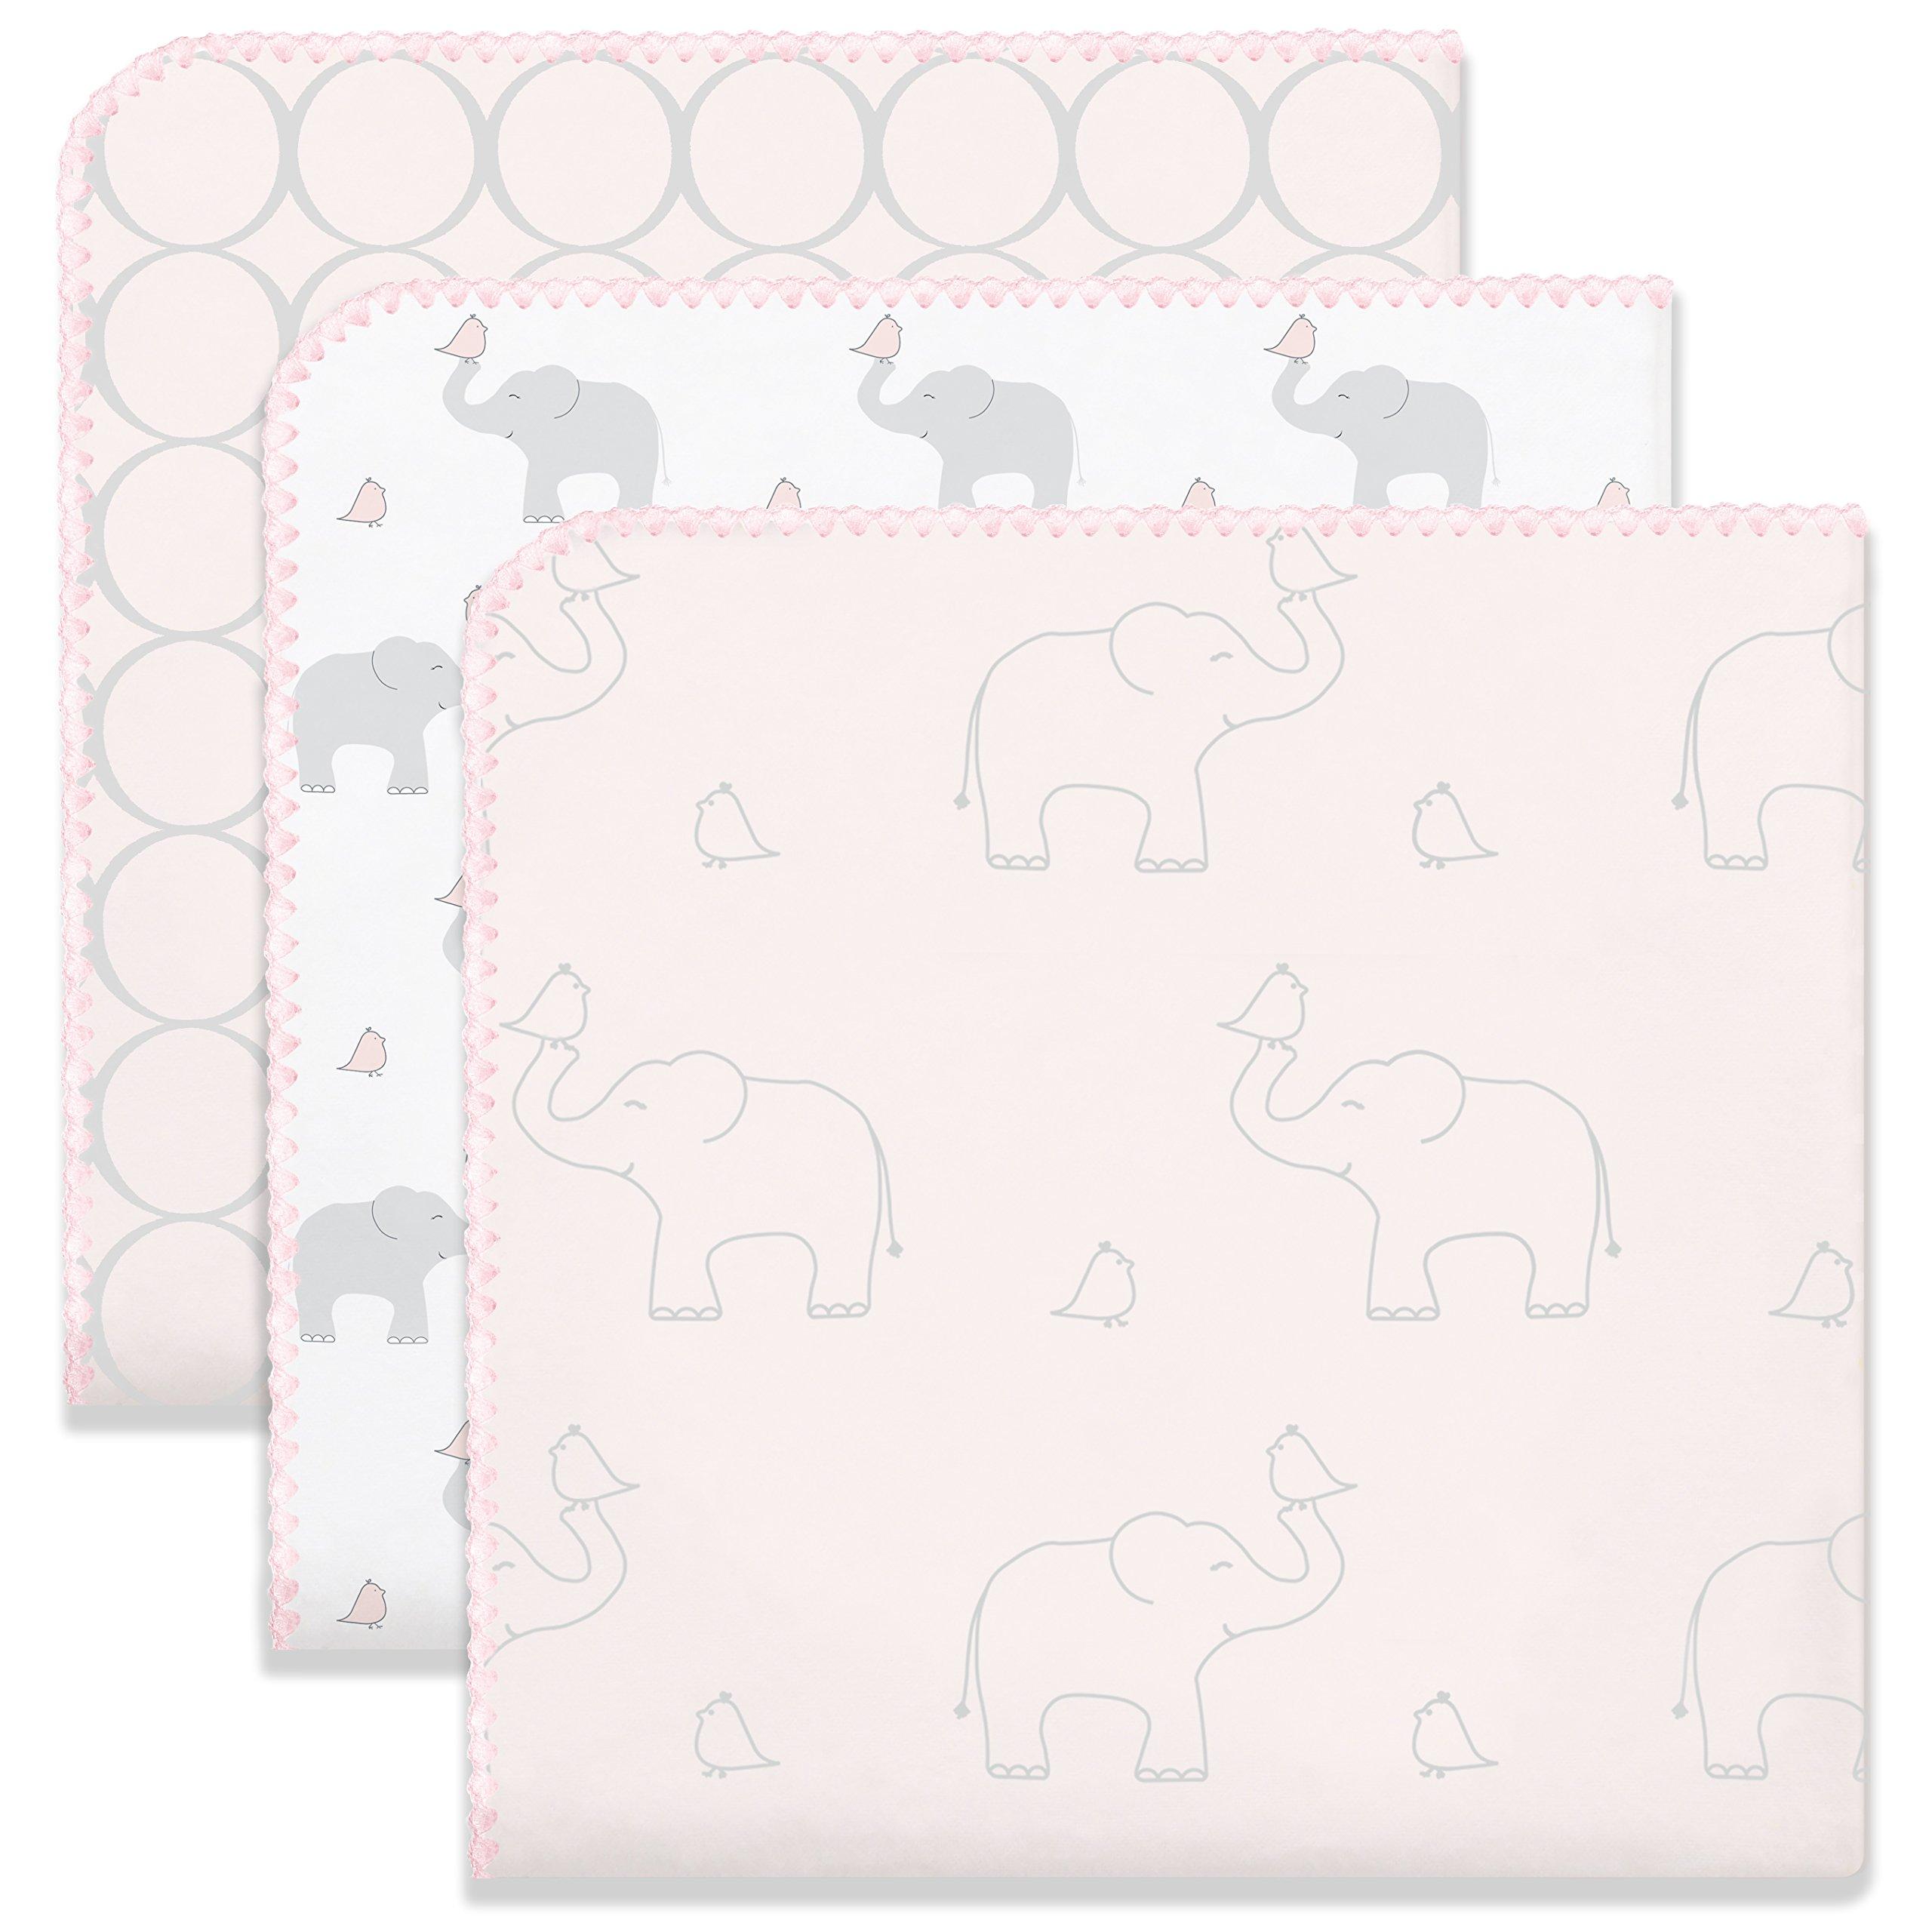 SwaddleDesigns Ultimate Swaddle Blankets, Set of 3, Mod Circles and Elephants, Sunwashed Pink